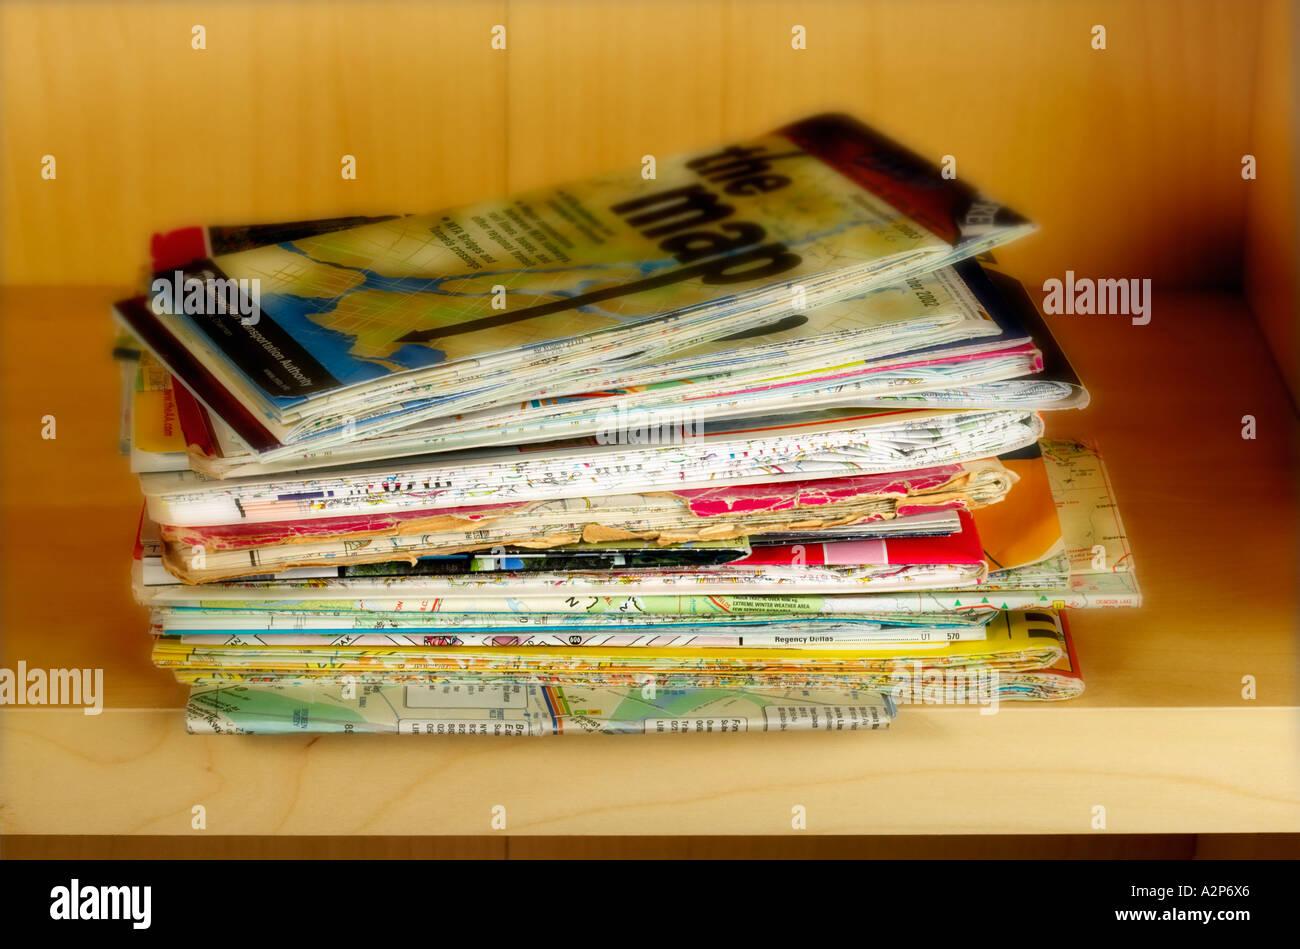 stack pile of travel maps on shelf - Stock Image